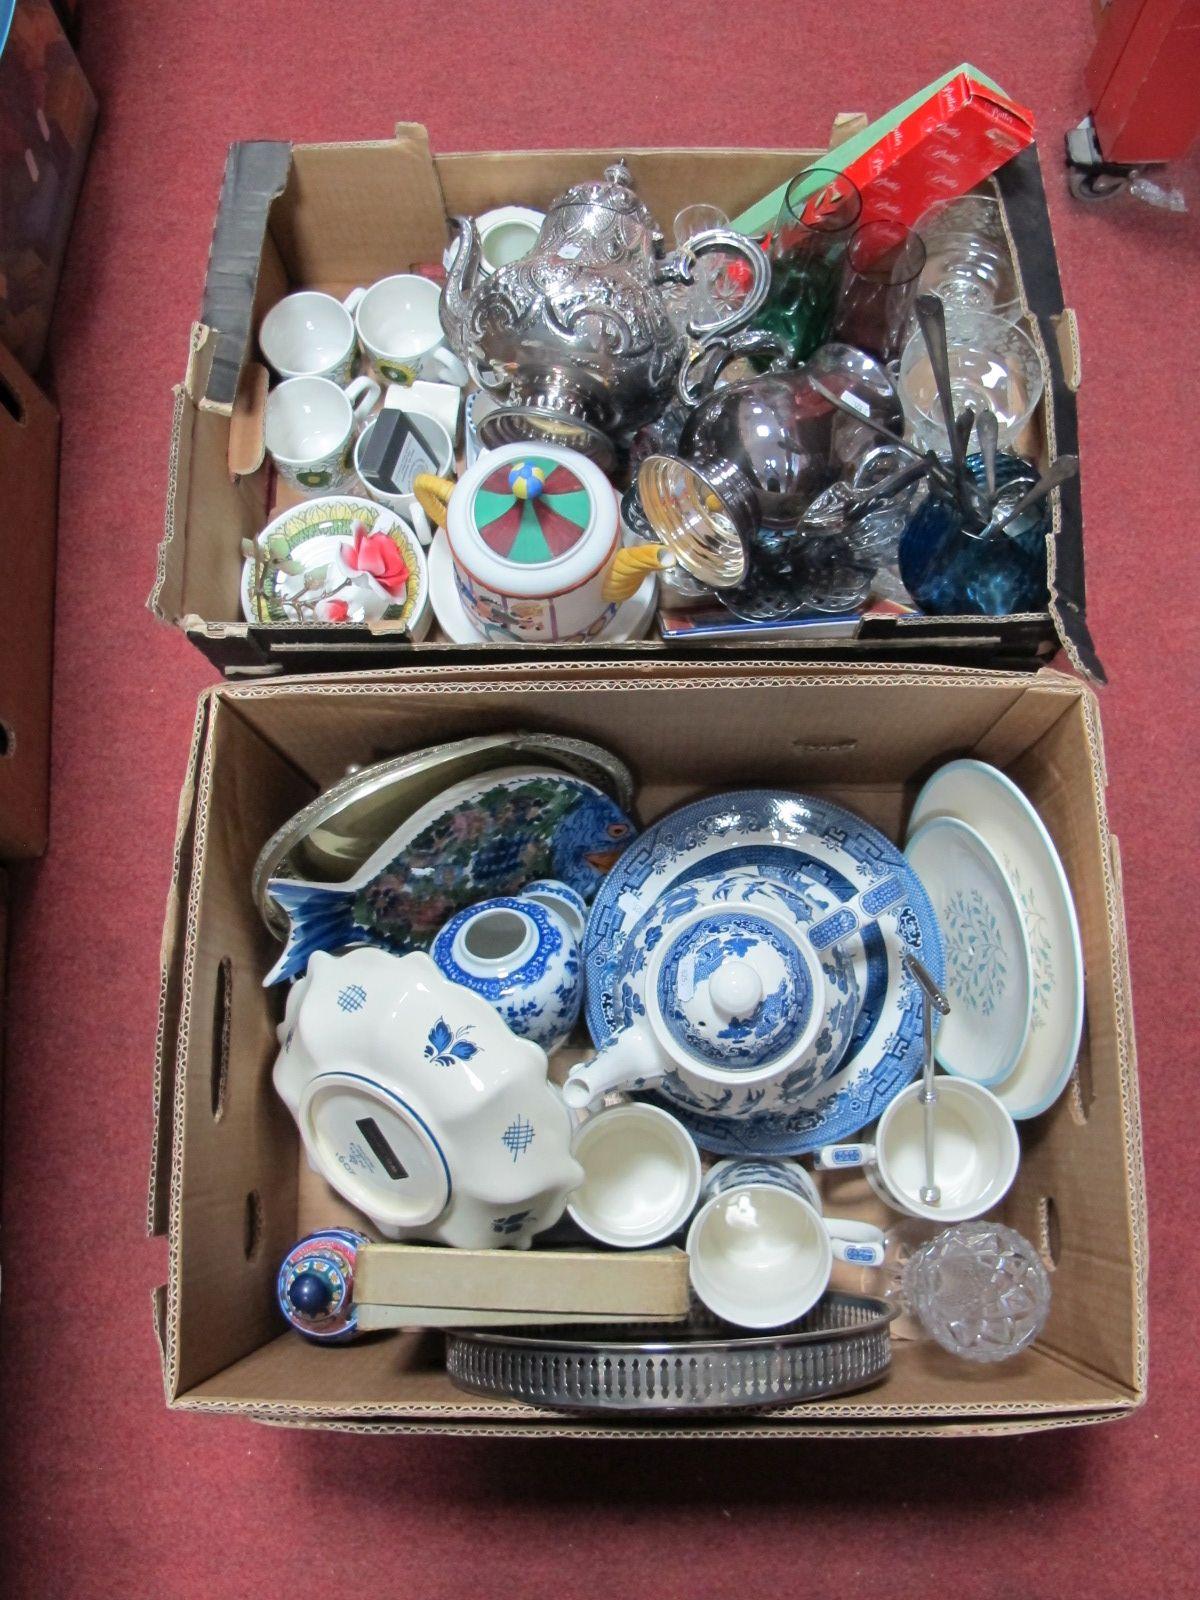 Lot 29 - Churchill Willow Dinner Ware, Swinnerton's cake stand, plated teapots, Christopher Wren teapot,